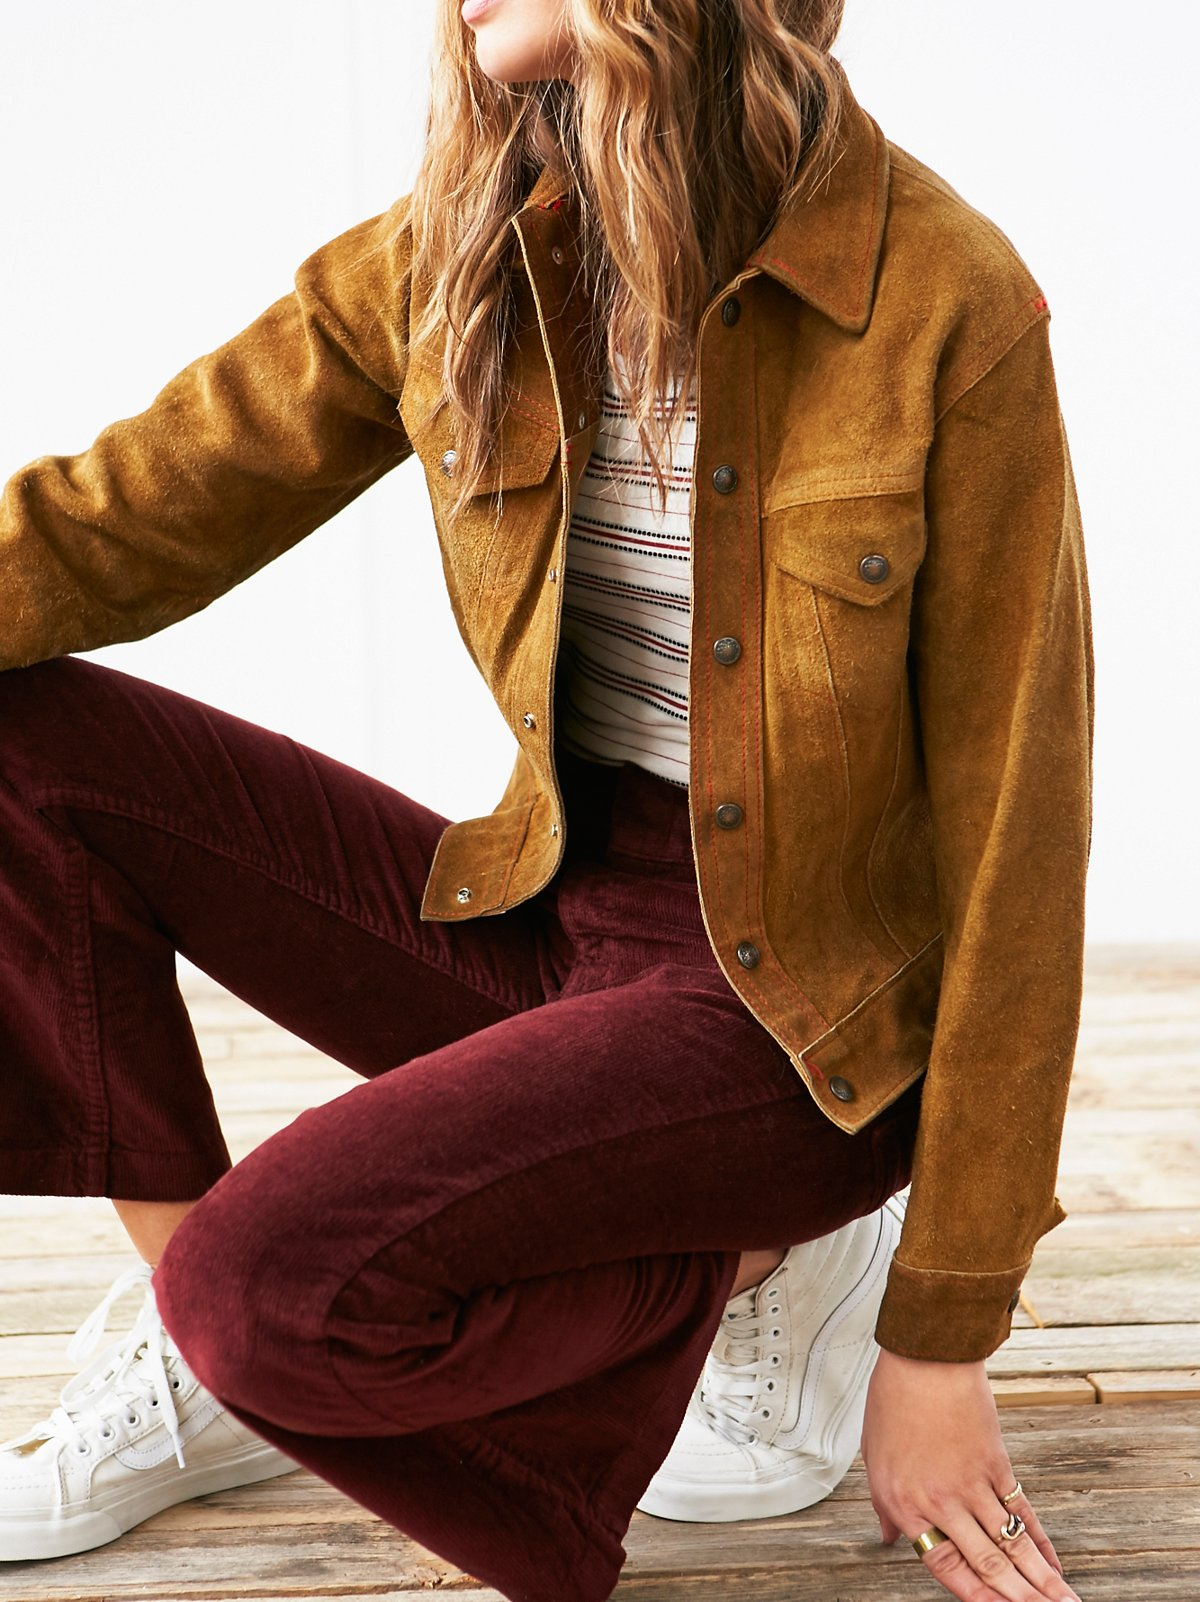 Vintage 1960s Suede Jacket